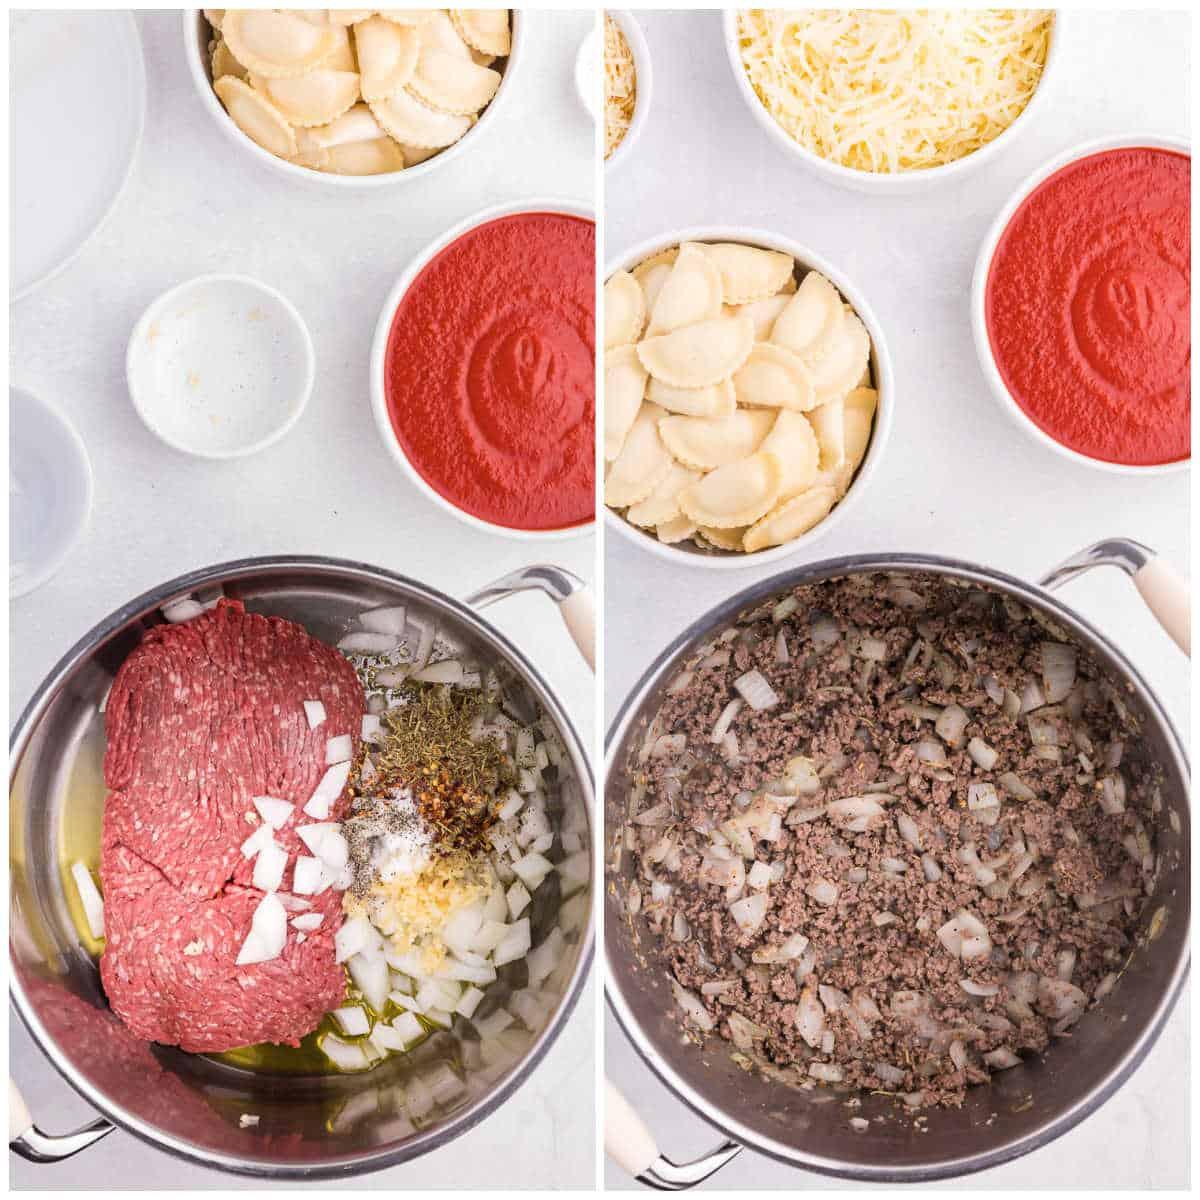 How to make slow cooker ravioli lasagna steps